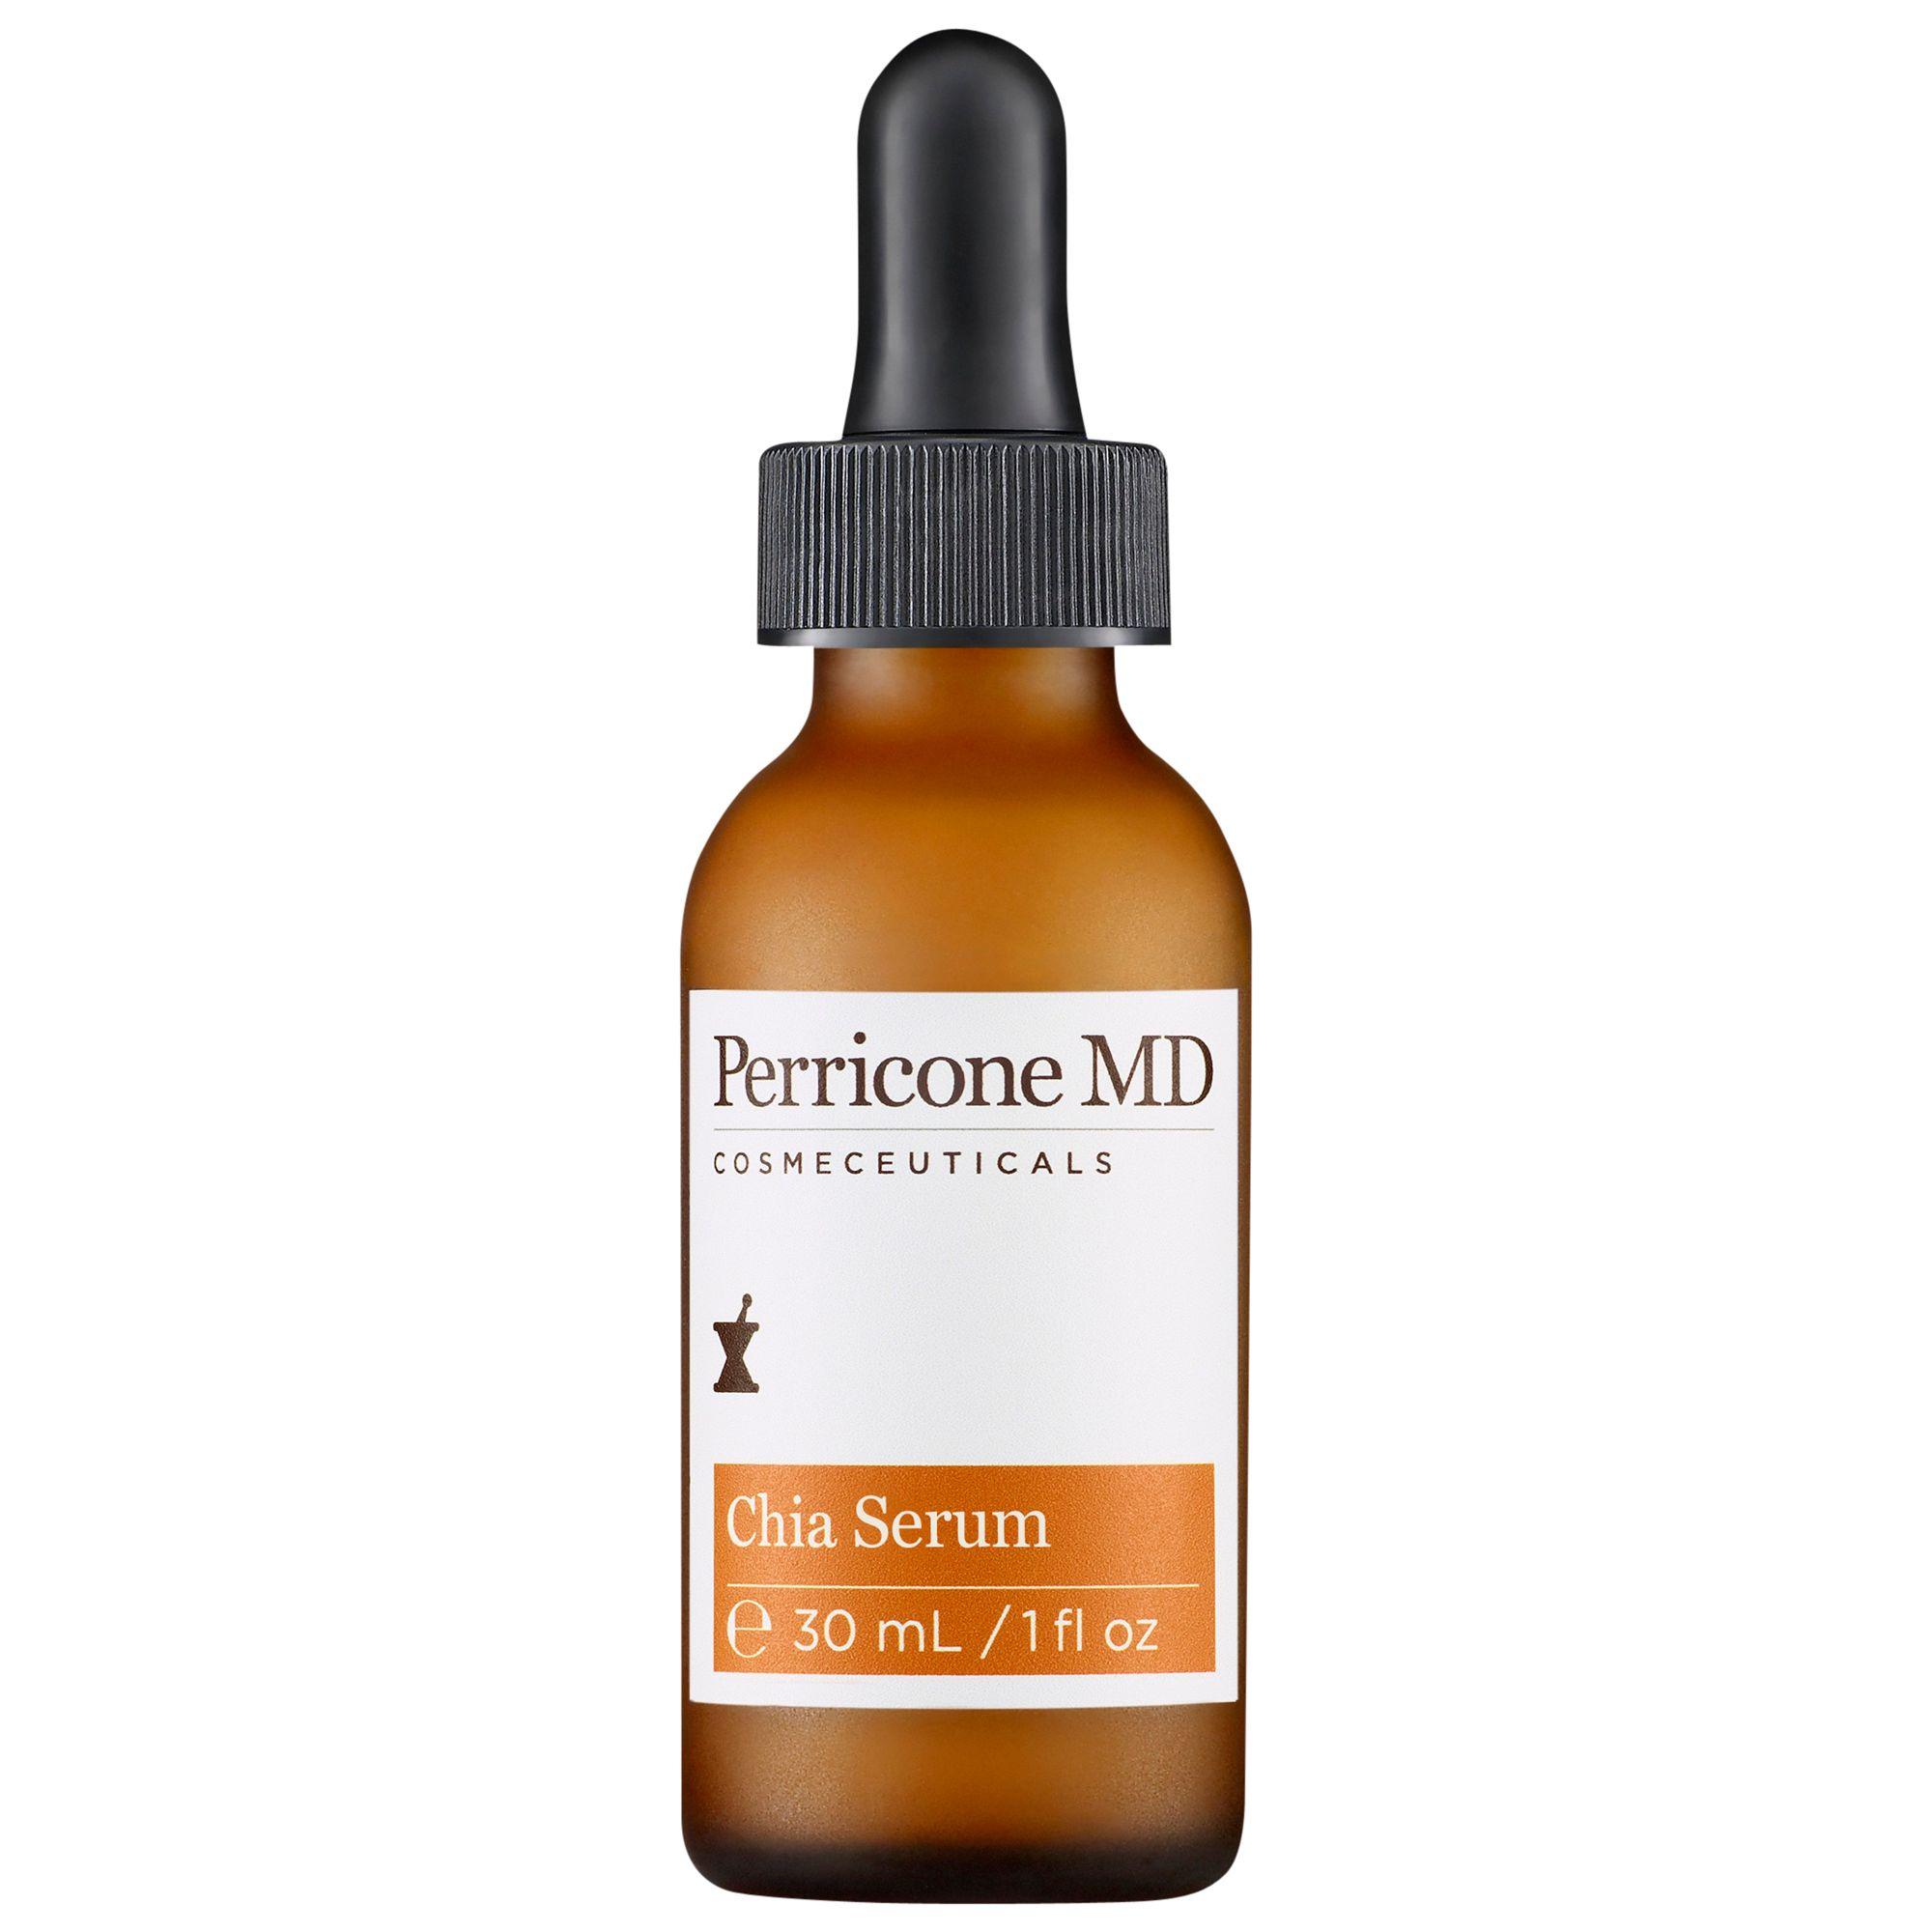 Perricone MD Perricone MD Chia Serum, 30ml